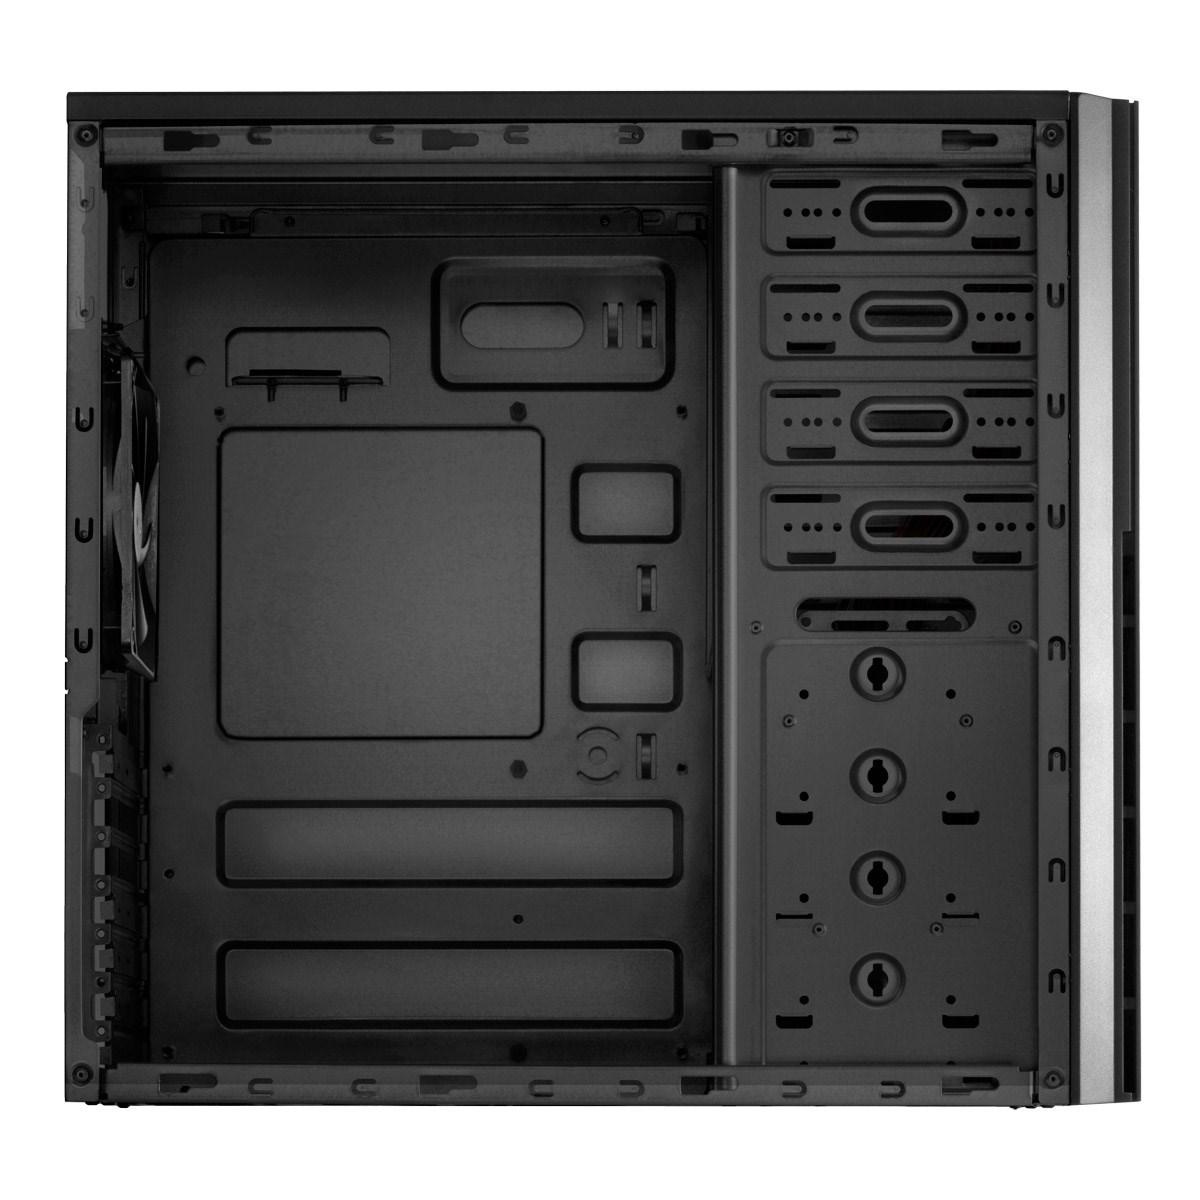 Boitier PC ATX, Micro-ATX, Mini-ITX Antec VSK-4000B-U3/U2 mini tour noir sans alim, informatique ile de la Réunion 974